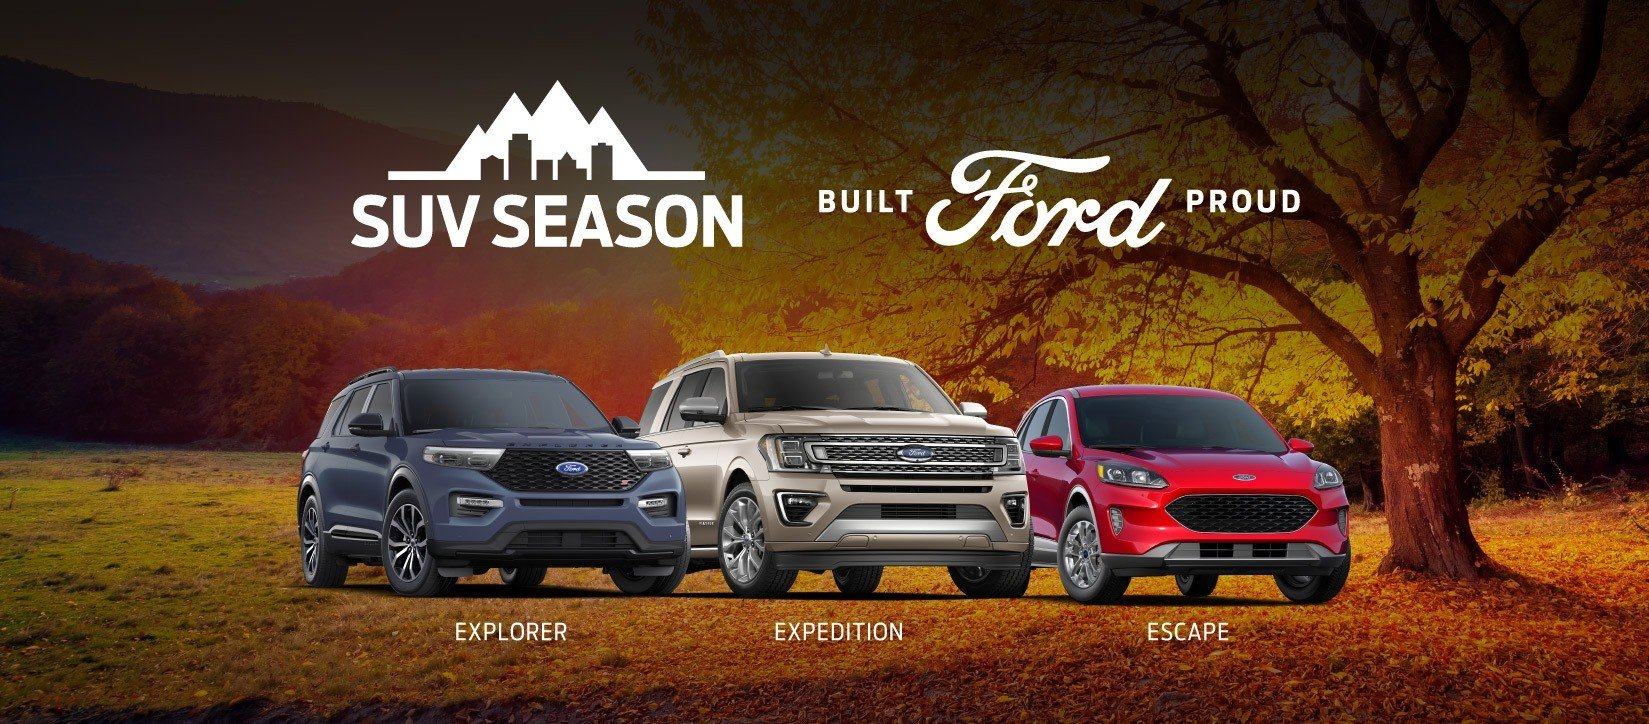 SUV Season 11-3-2020